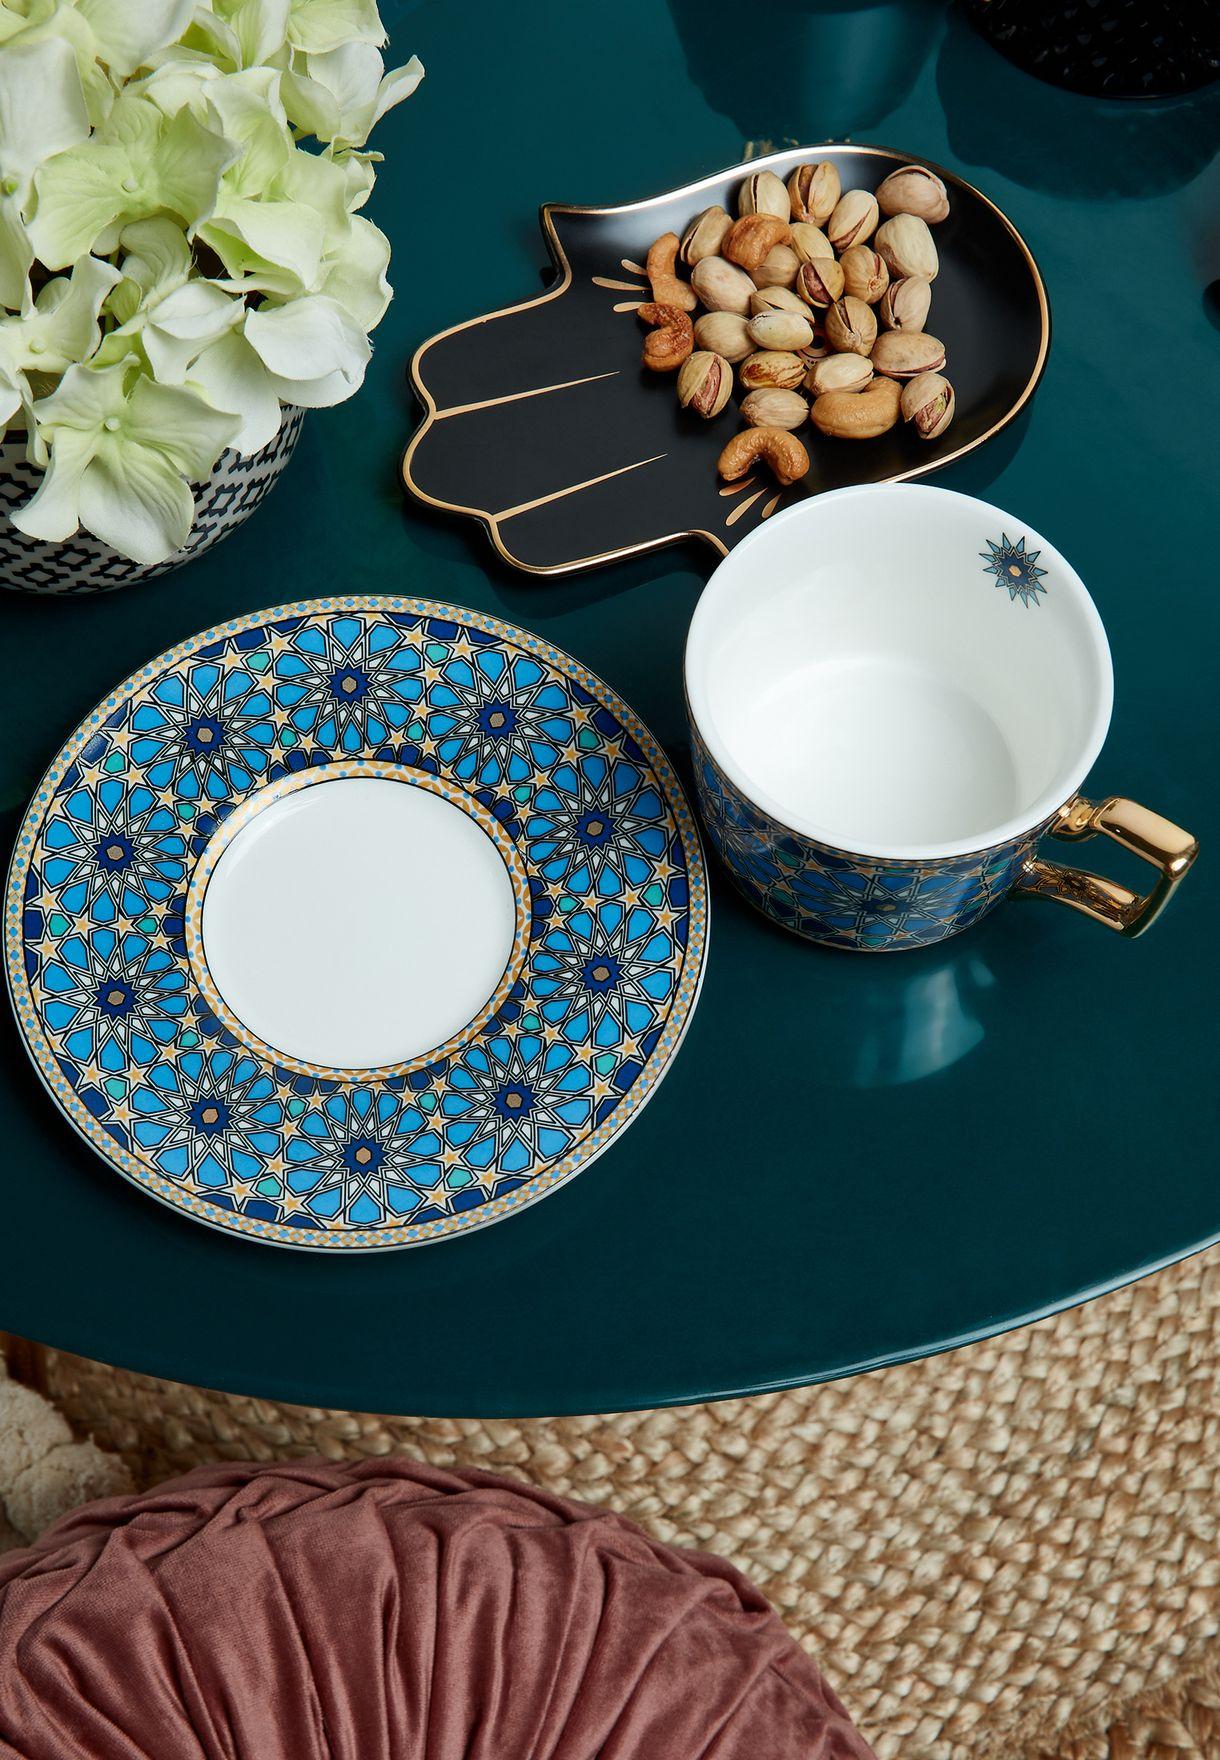 Patterned Tea Cup & Saucer